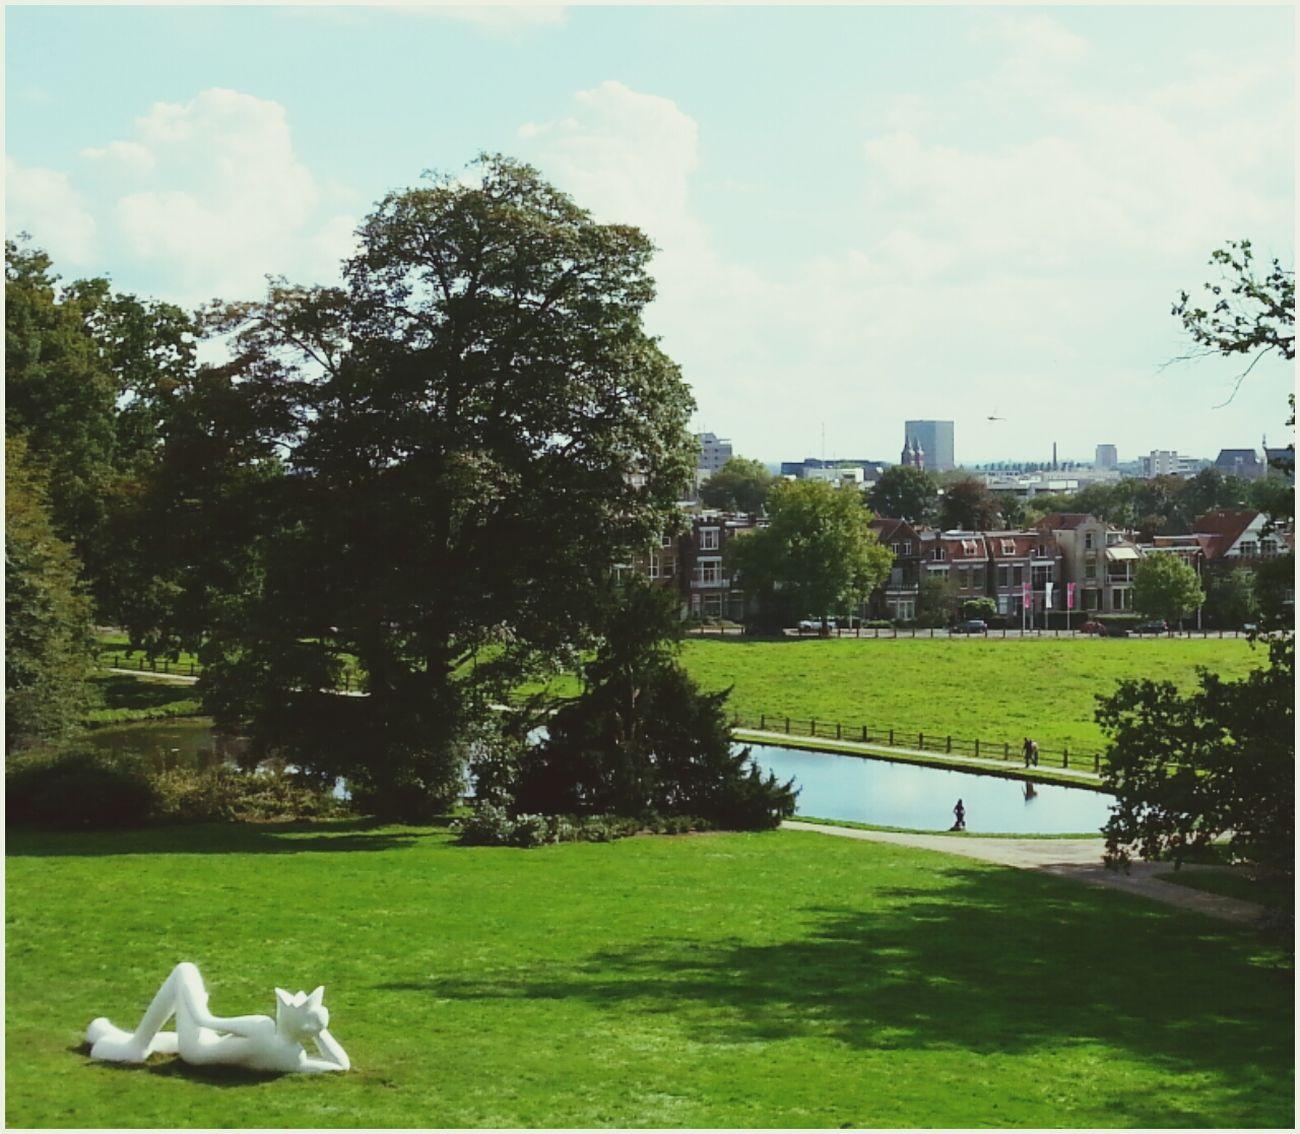 Arnhem Sonsbeekpark Dutch Landscape Statue lazy king